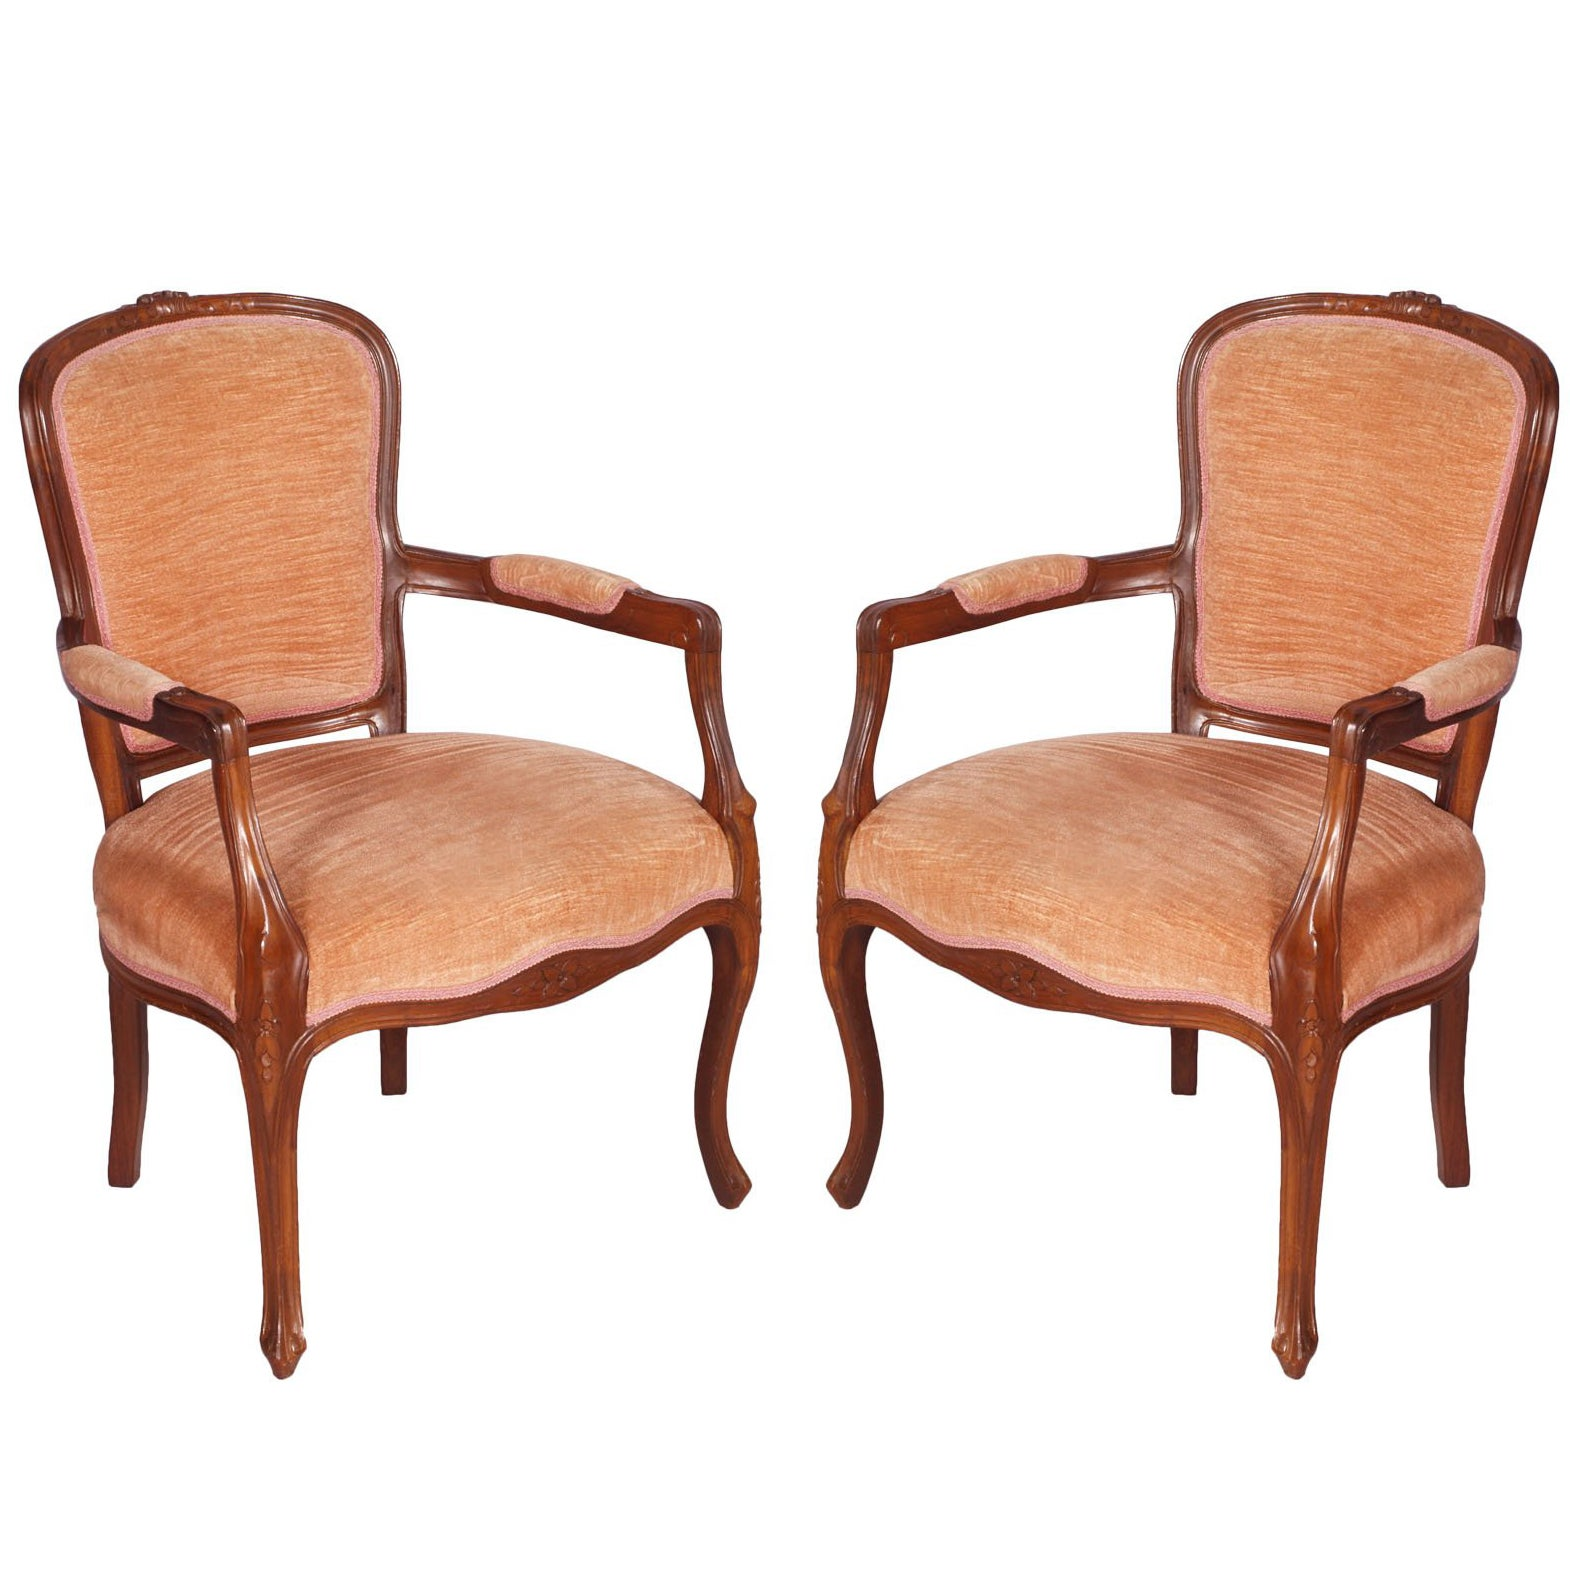 Venetian 1910s Art Nouveau armchairs in hand carved Walnut with original Velvet